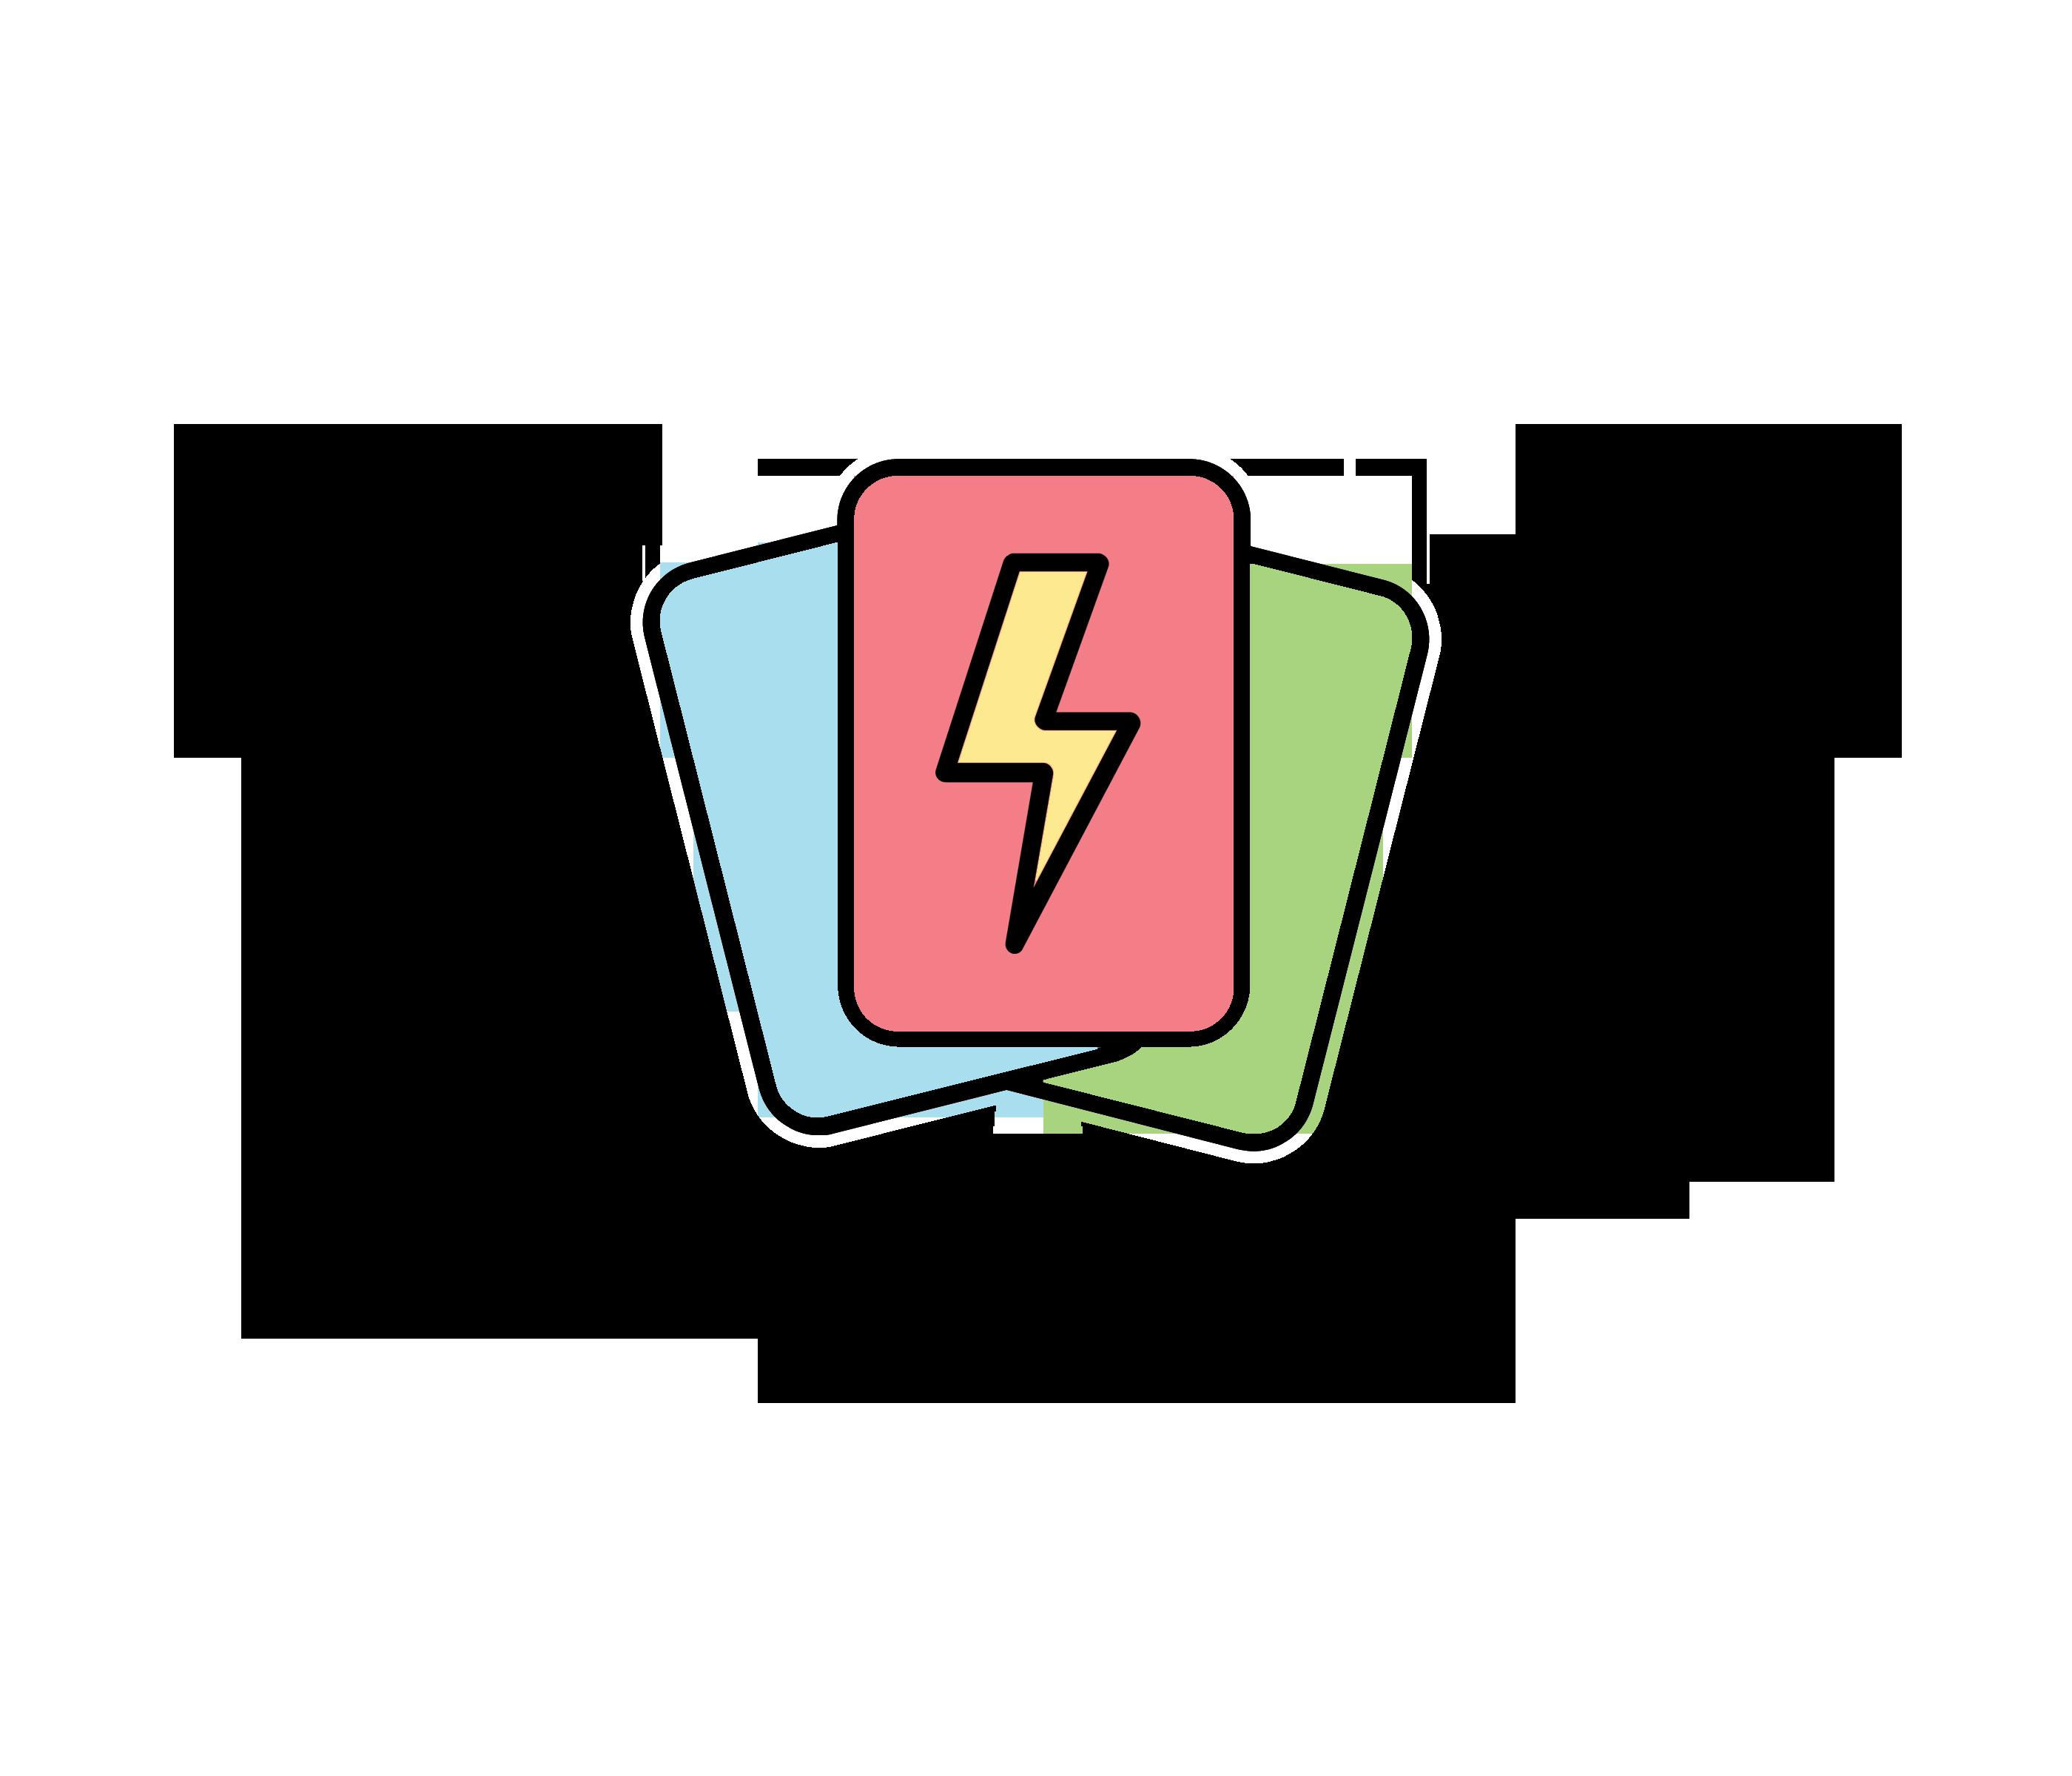 Grand prix . Magic clipart shuffle card